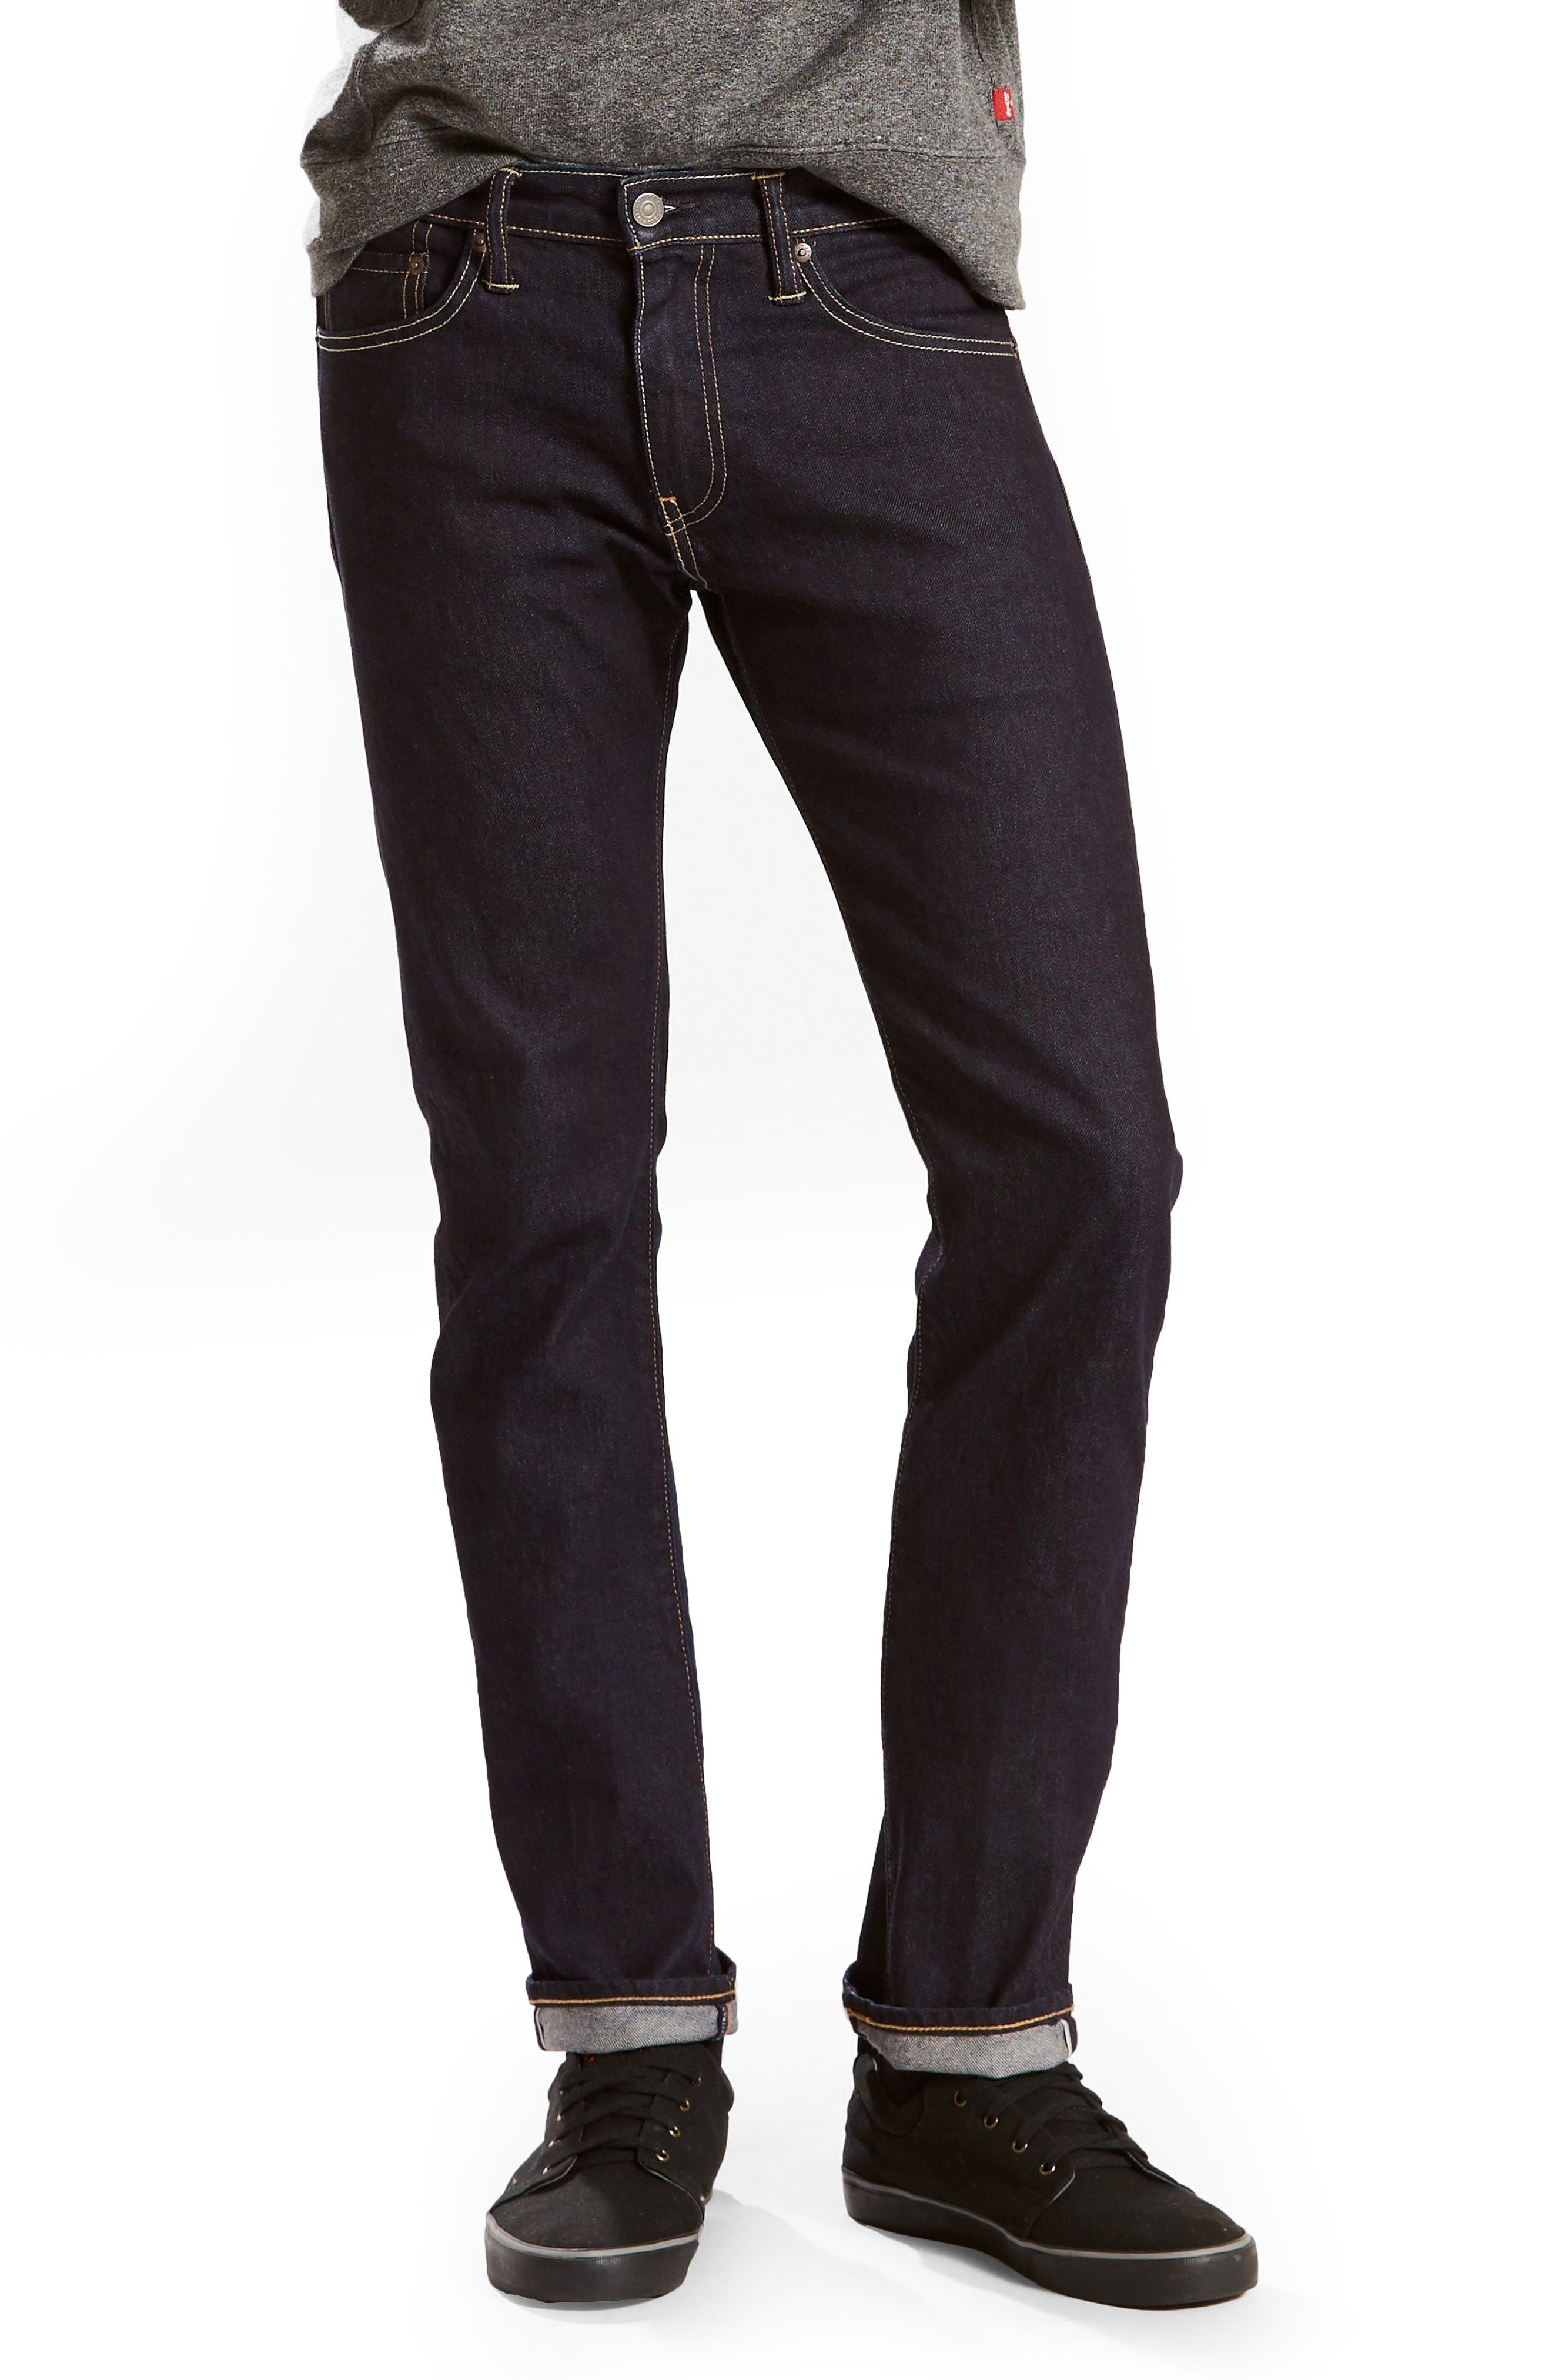 Main Image - Levi's 511 Slim Fit Jeans (Selvedge Stirline)